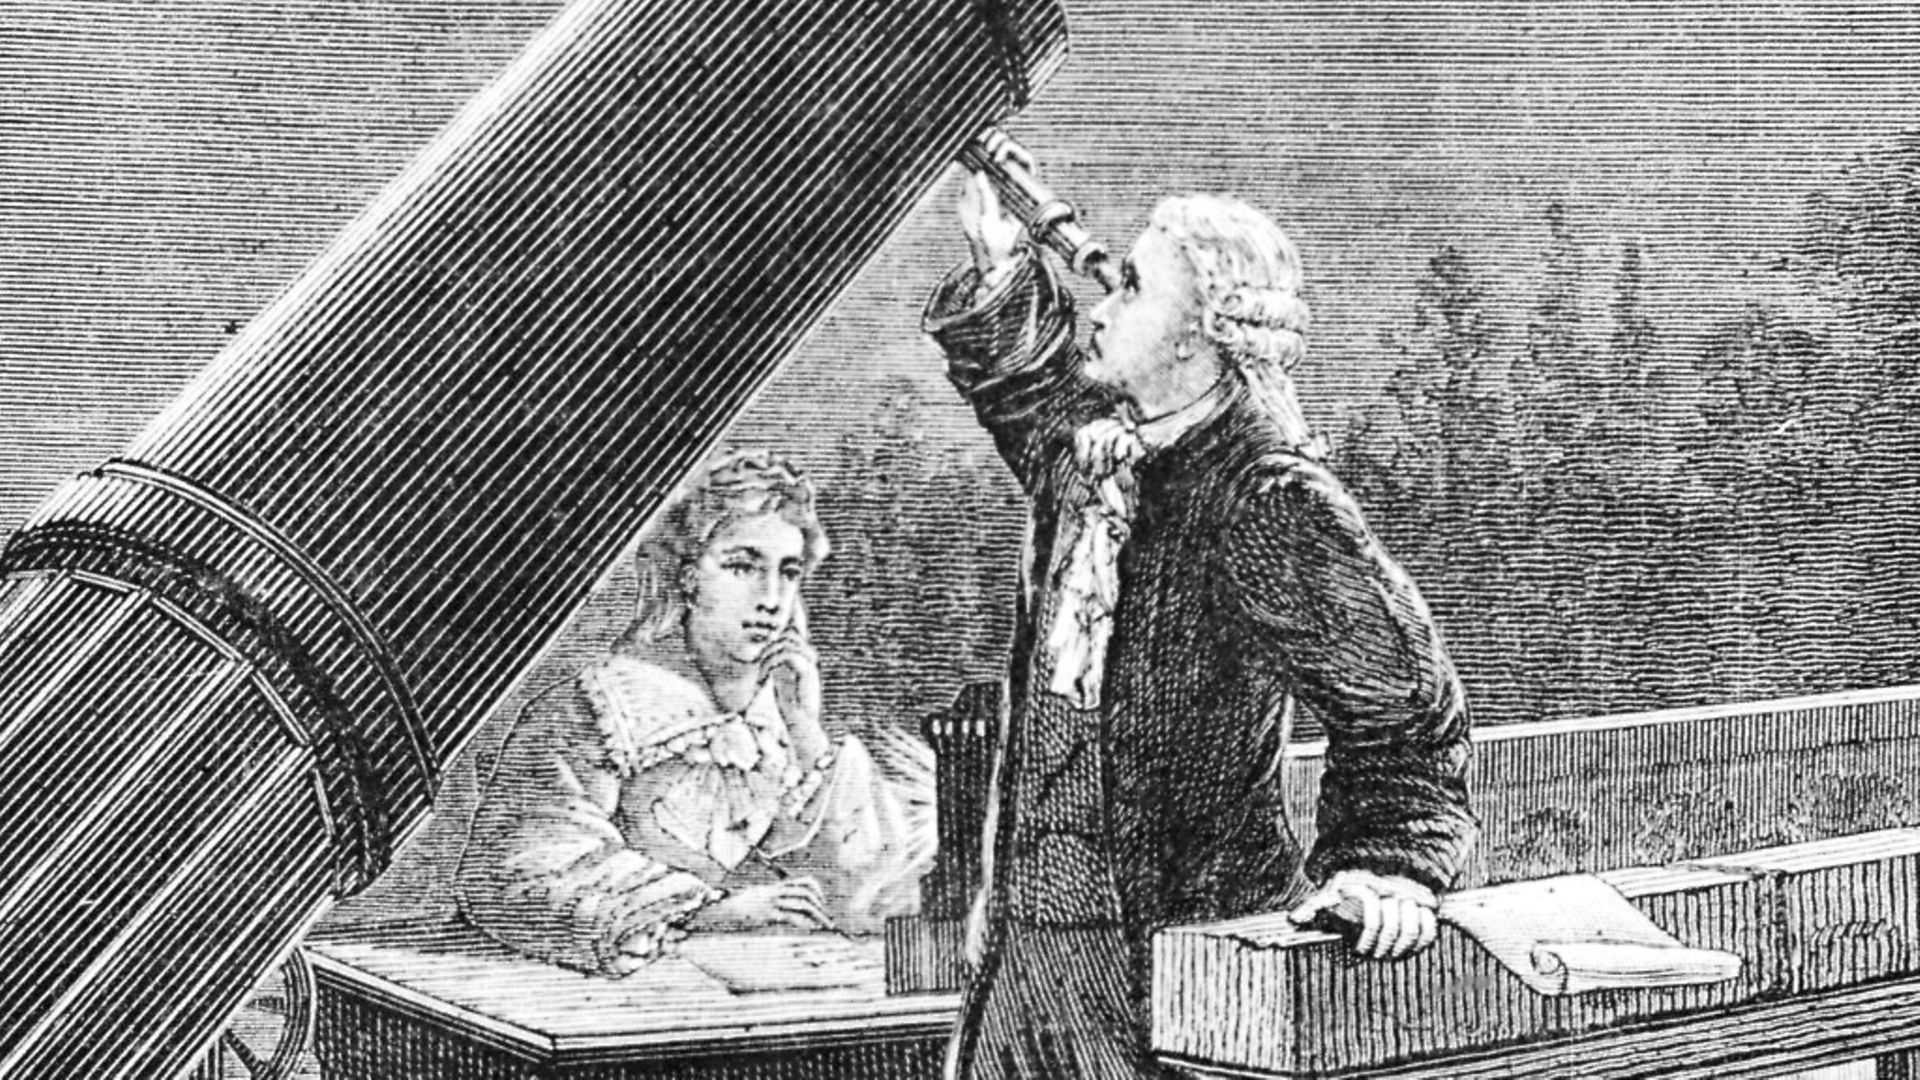 (Original Caption) William Herschel (1738-1822), famous astronomer discovering the planet Uranus. He is assisted by his sister, Caroline Lucretia (1750-1848). - Credit: Bettmann Archive